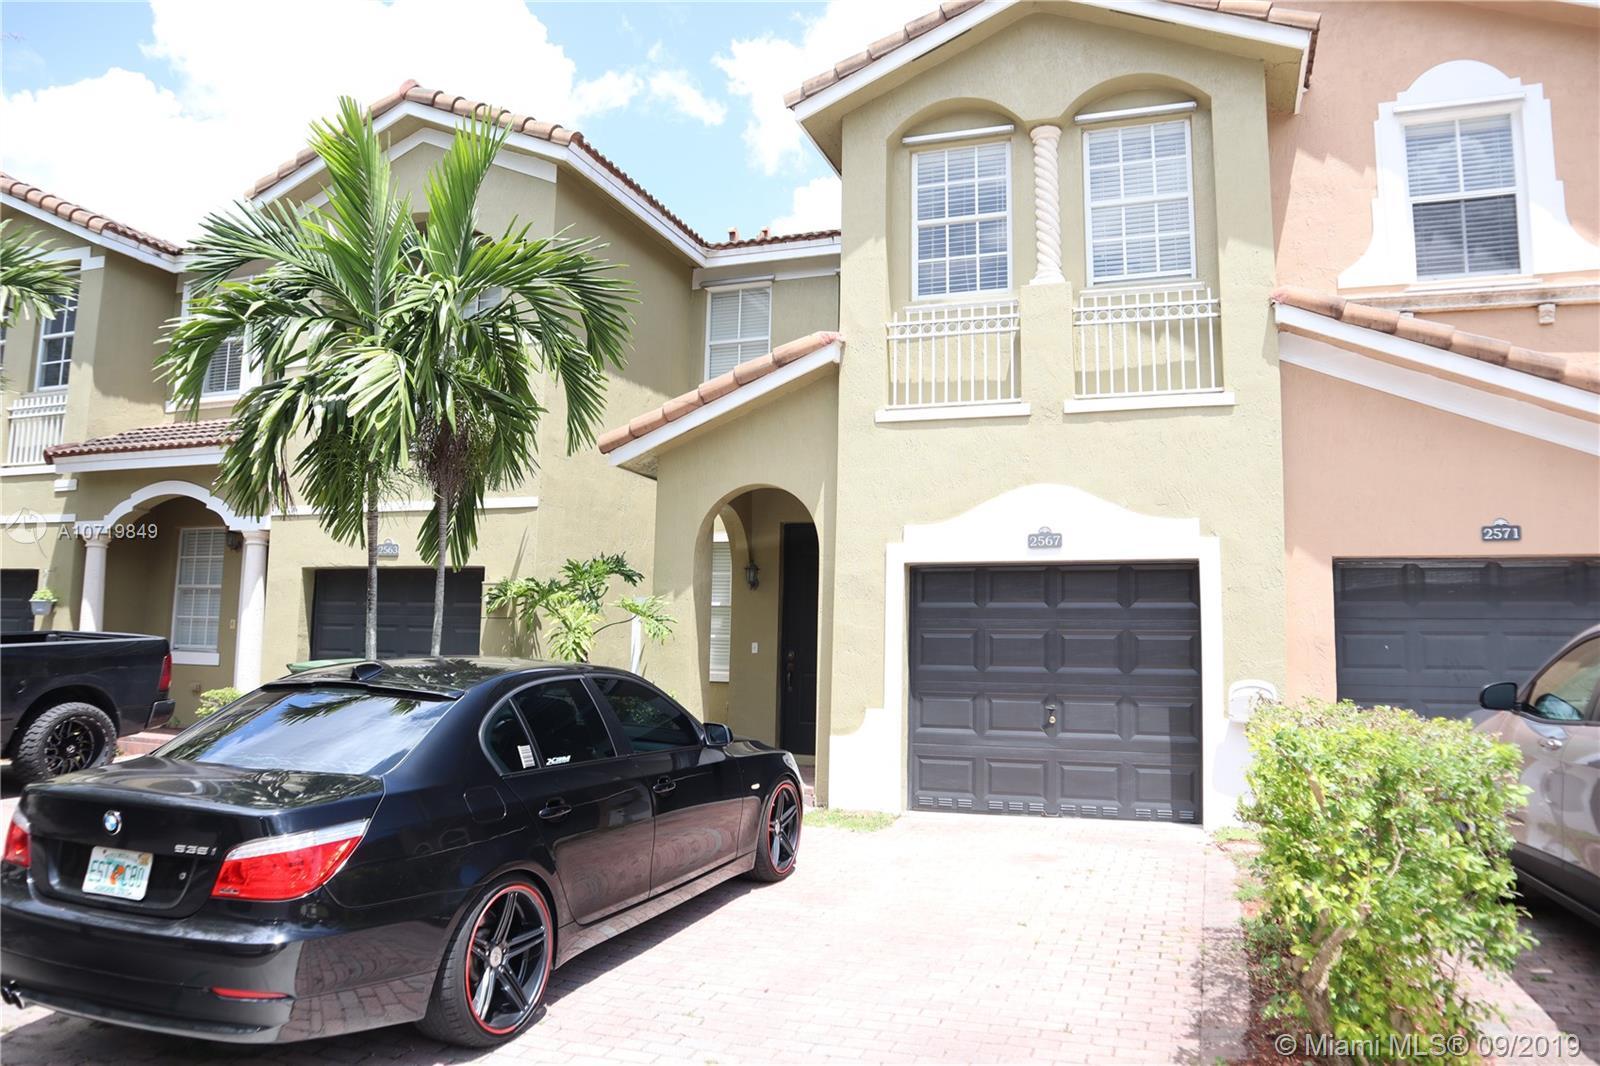 2569 SE 13 Ct, Homestead, FL 33035 - Homestead, FL real estate listing